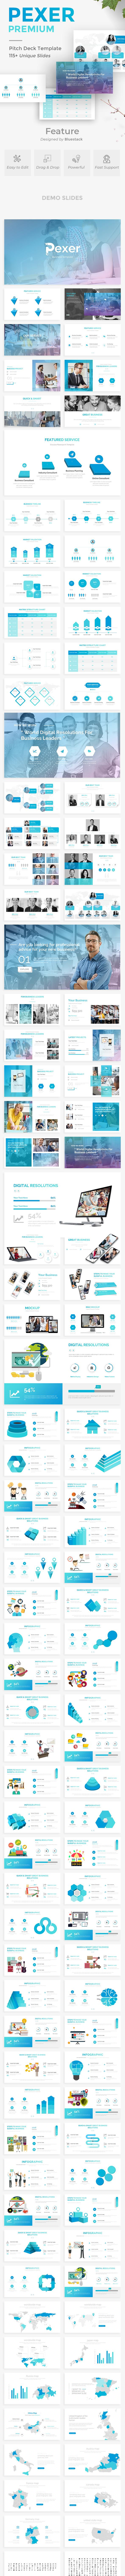 Pexer Business Proposal Google Slide Template - Google Slides Presentation Templates